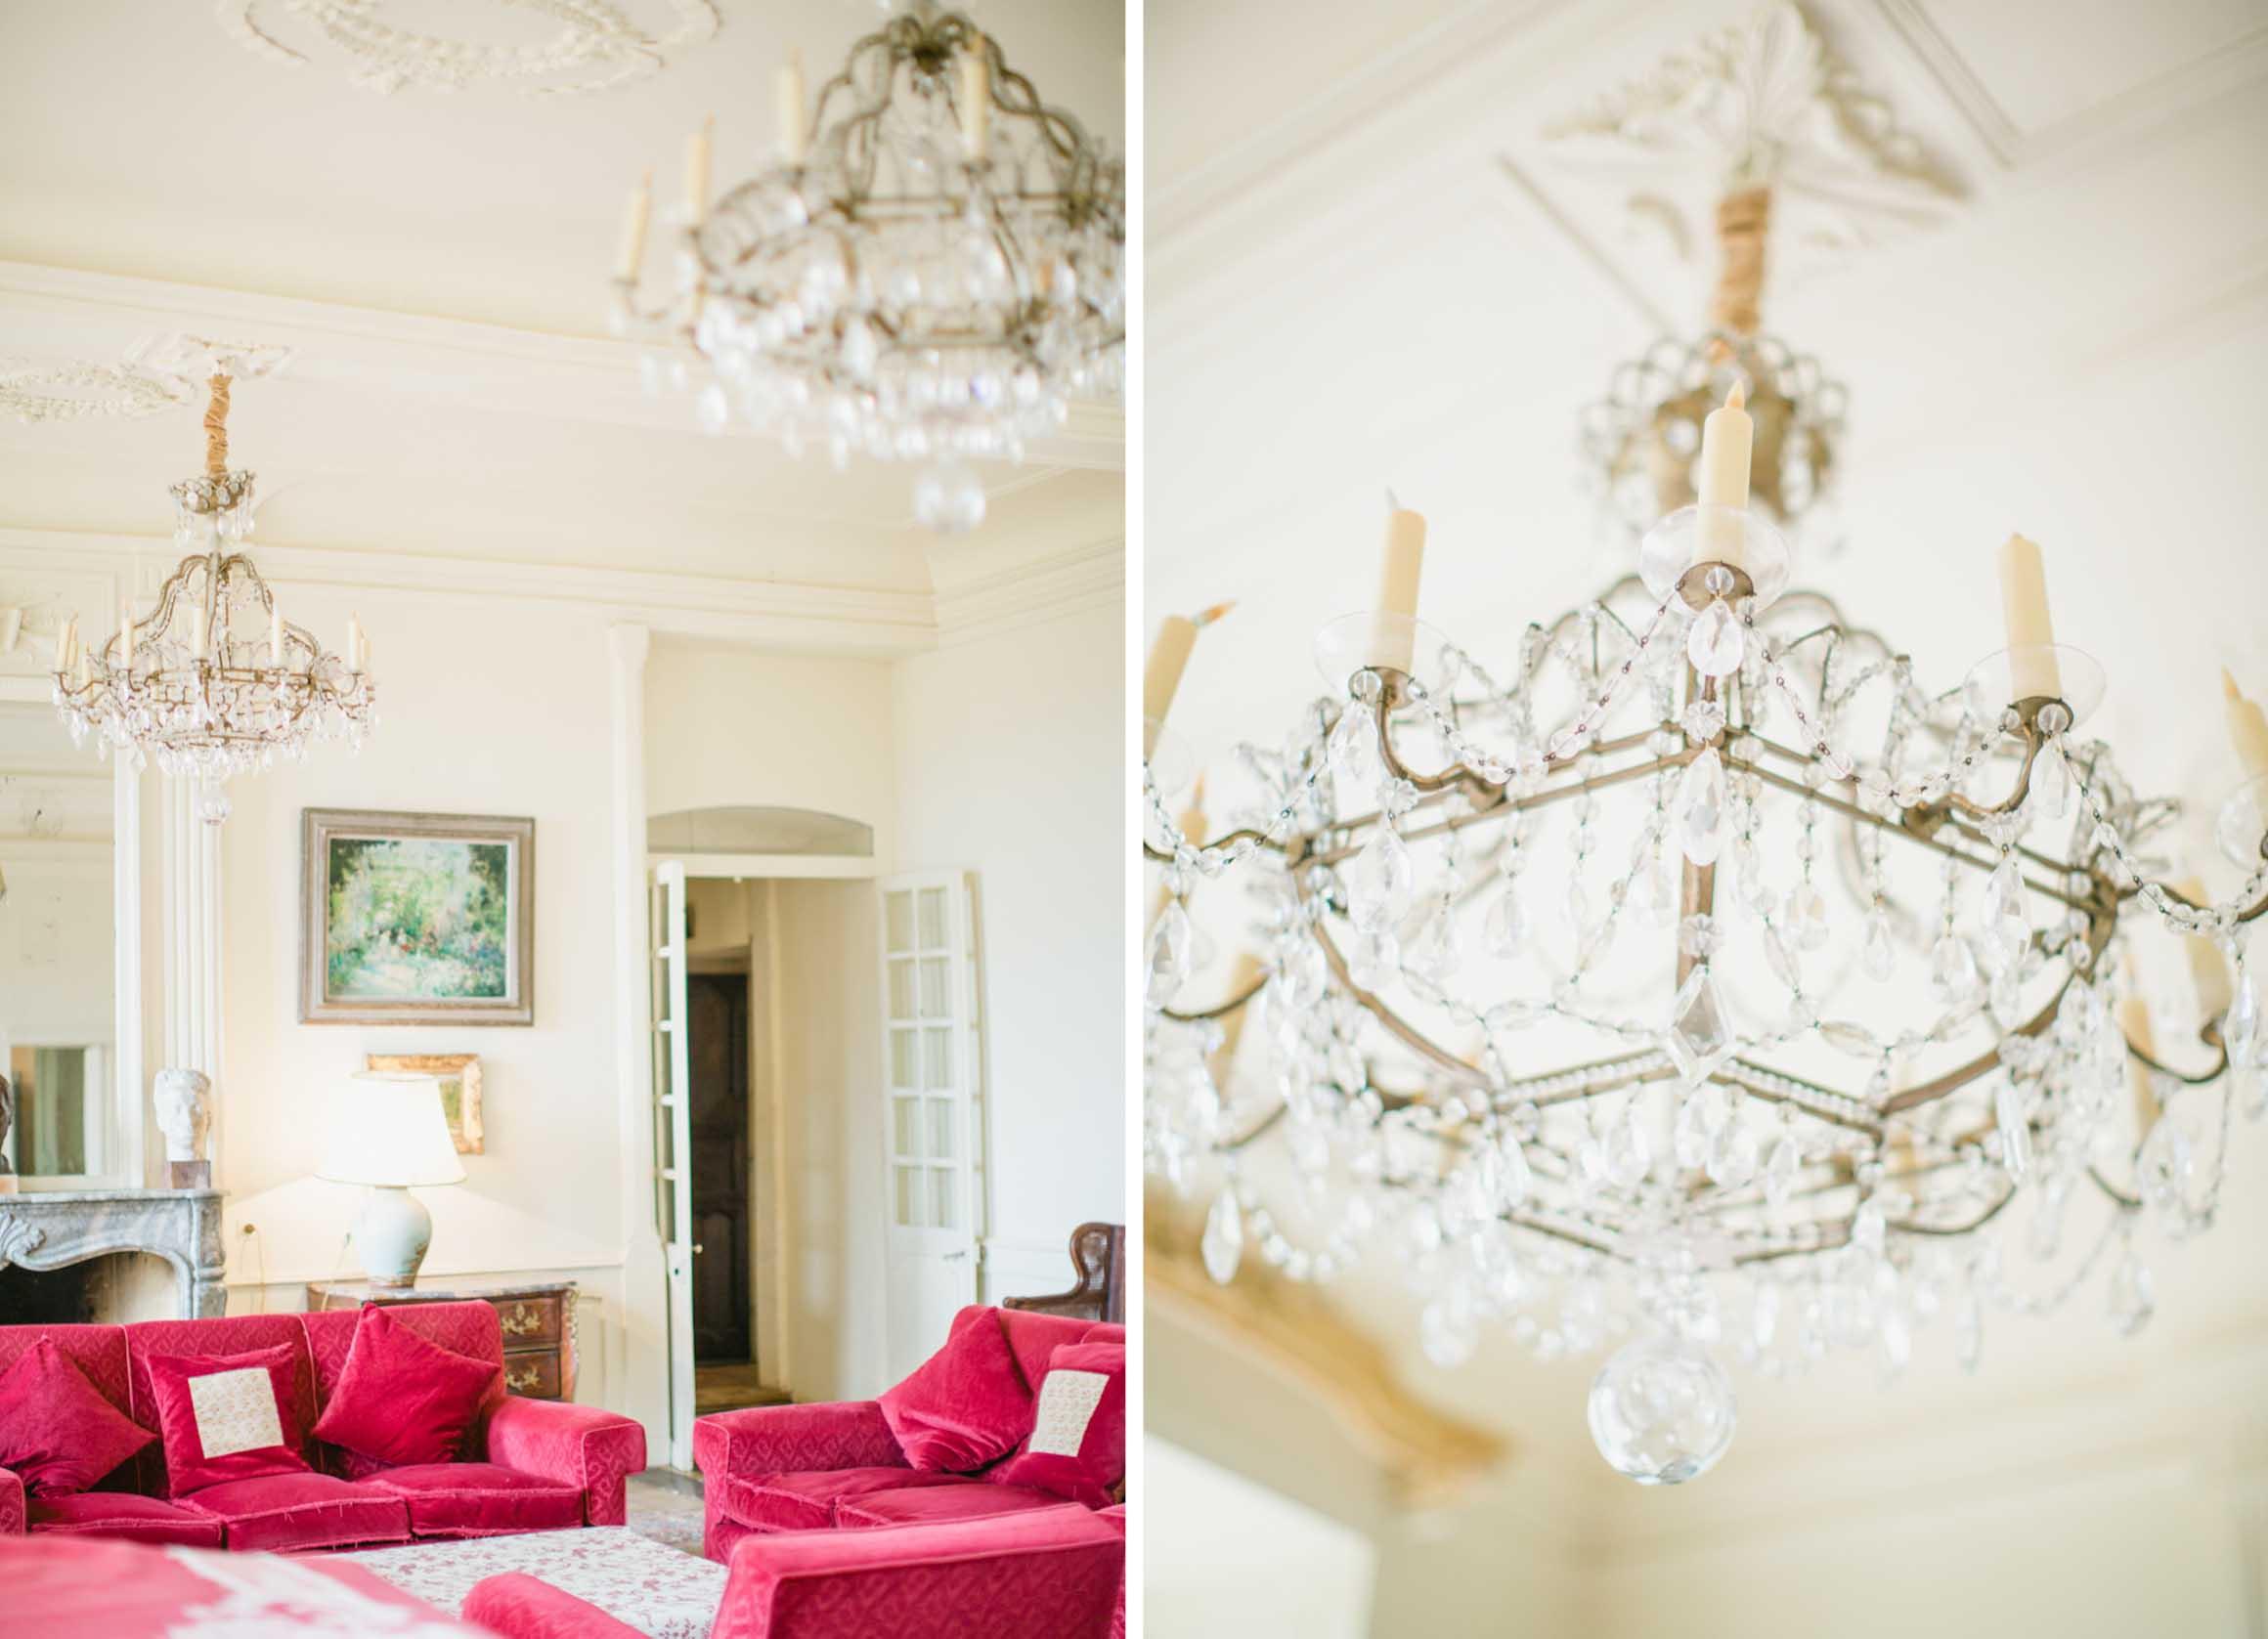 Amy O'Boyle Photography, Destination & UK Fine Art Film Wedding Photographer, Chateau Cazenac Wedding, France Dordogne Wedding Photographer 4.jpg